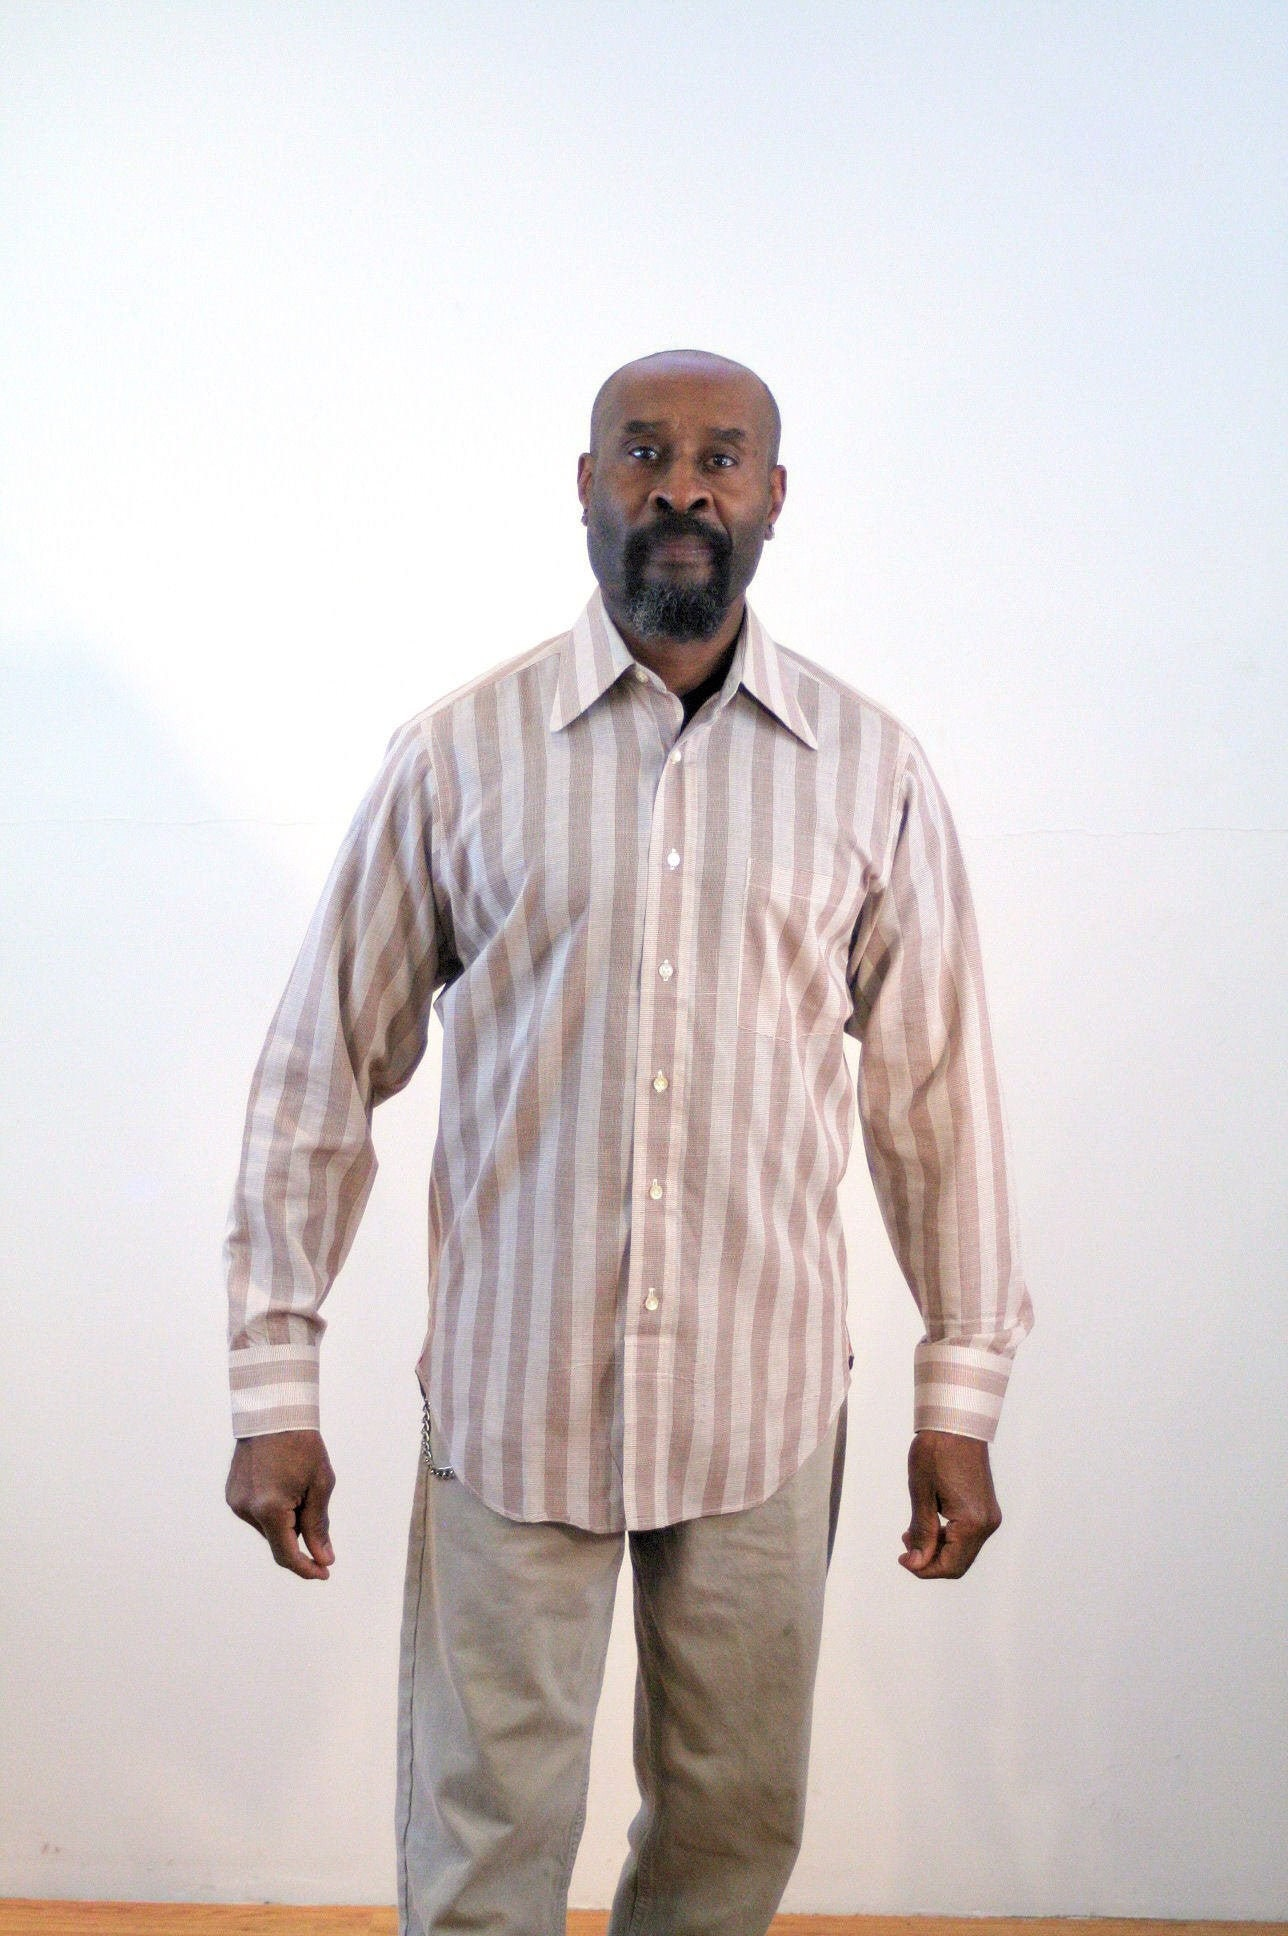 1970s Men's Shirt Styles – Vintage 70s Shirts for Guys 70S Jordan Marsh Micro Plaid Shirt M, Vintage Mens Mini Tattersalls Hathaway Button Up, 15 - 34 Medium $18.90 AT vintagedancer.com